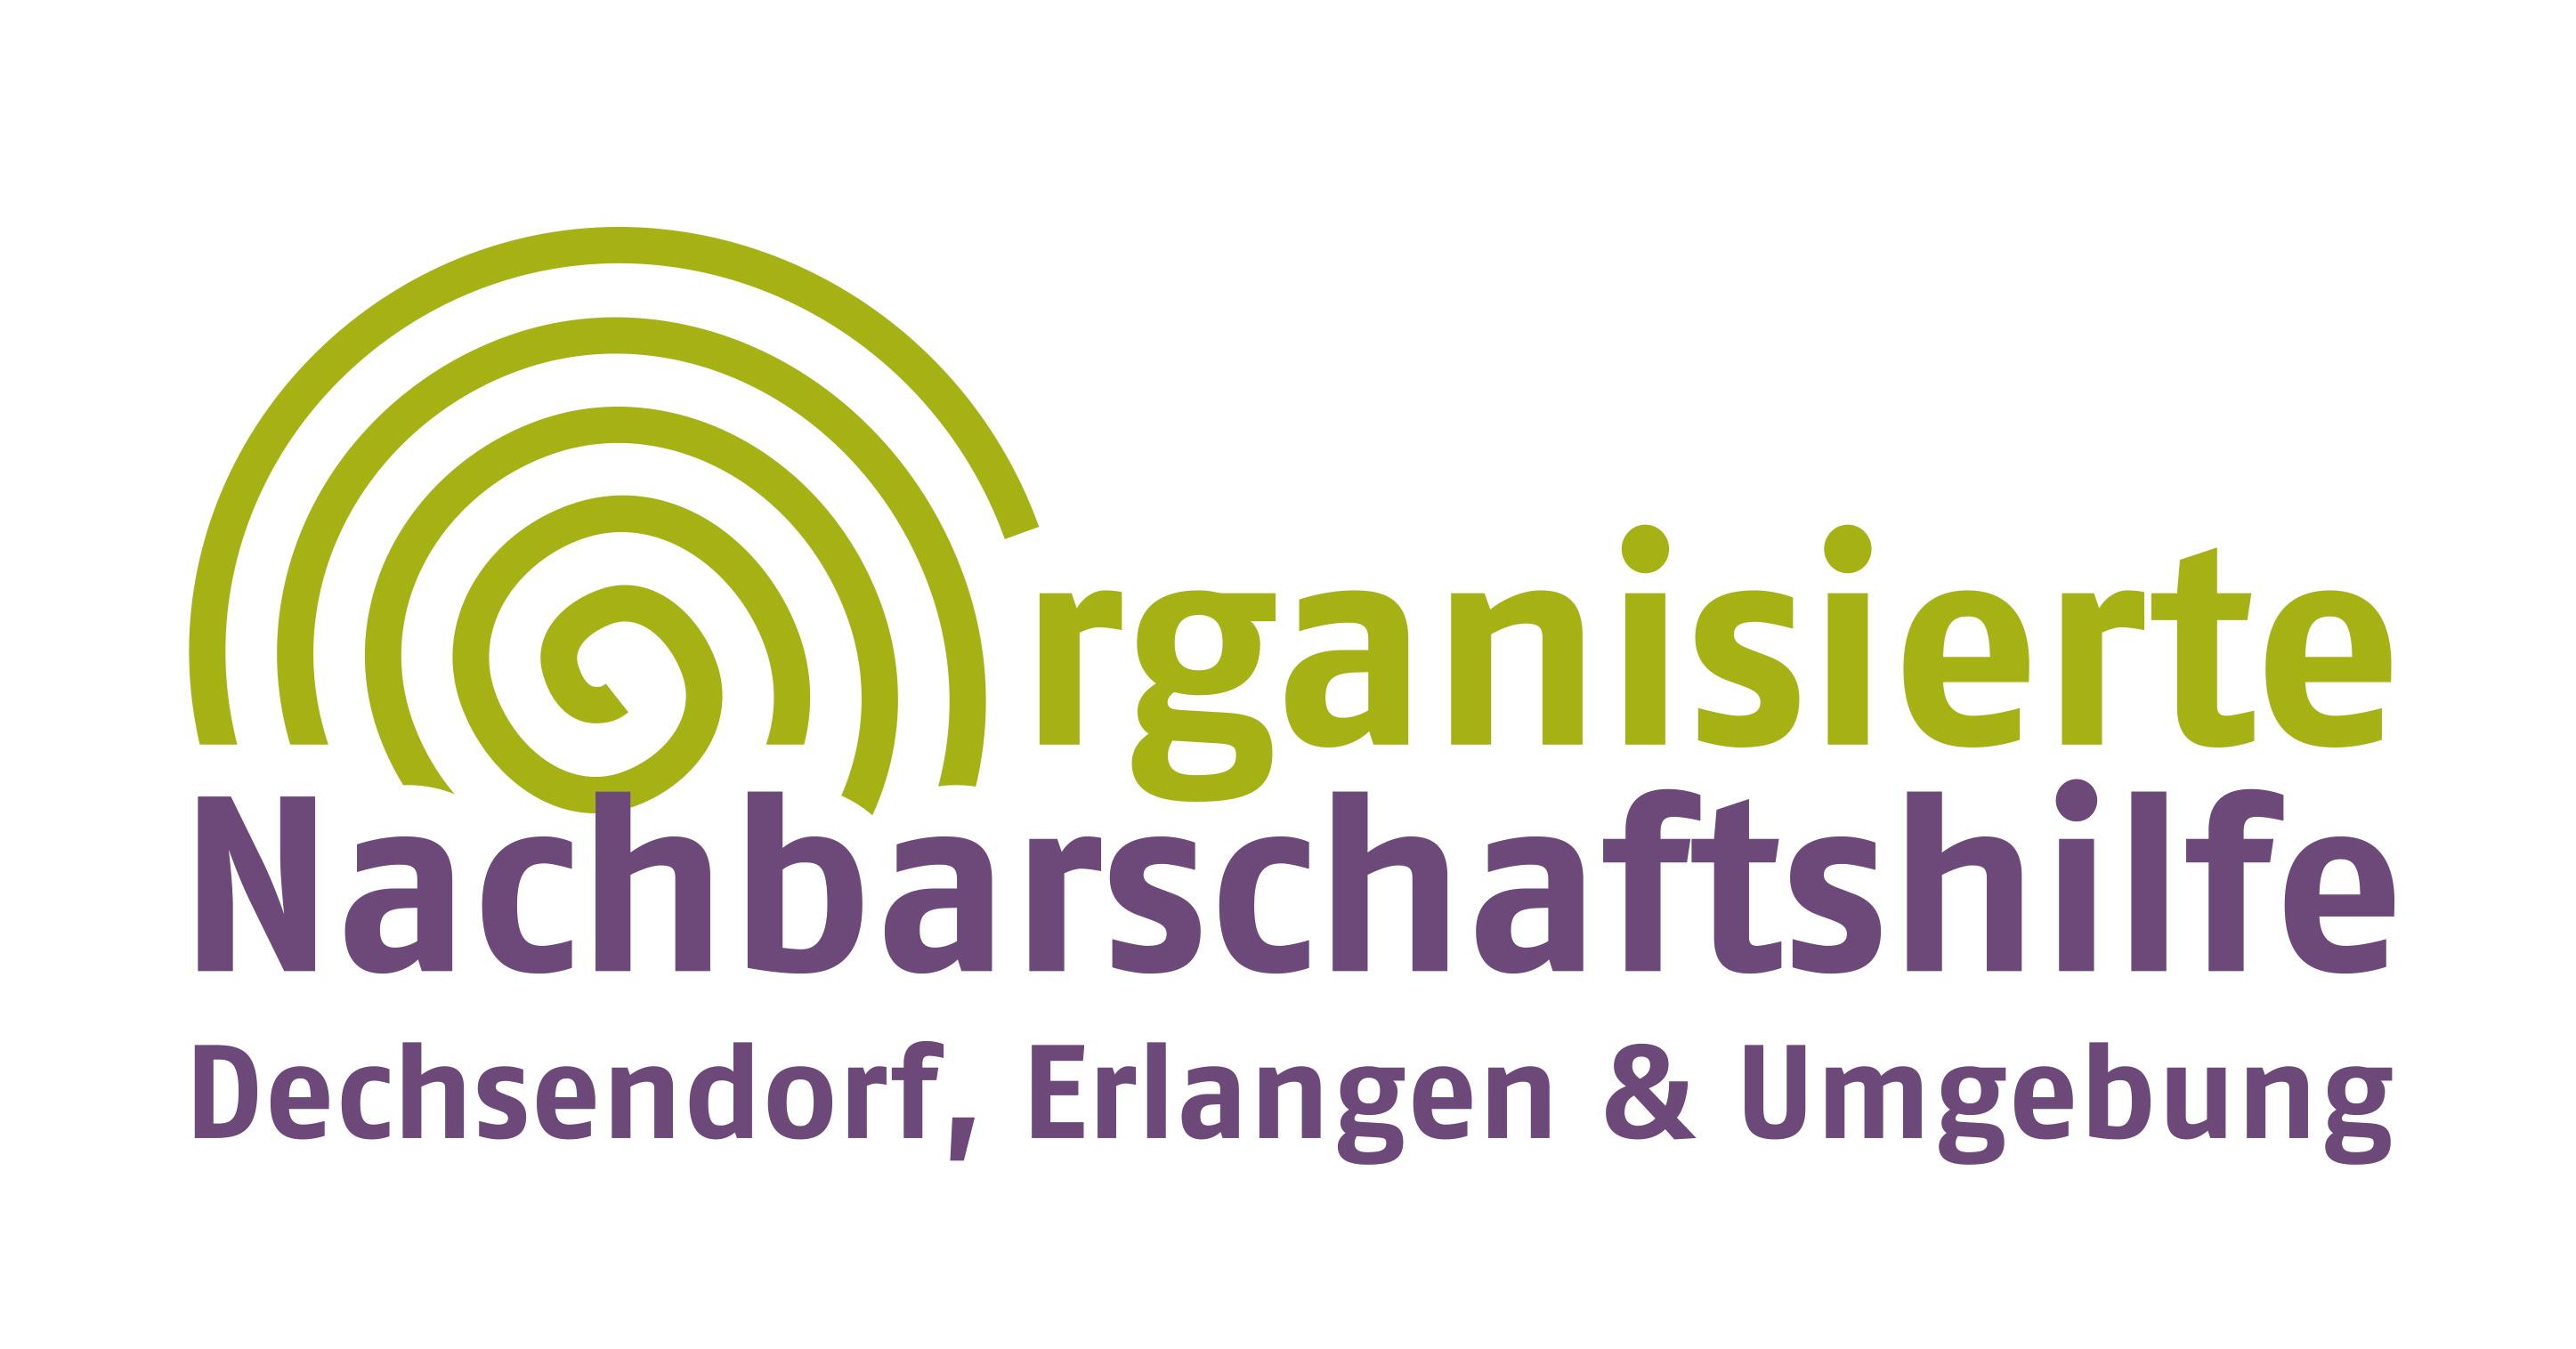 logo_nachbarschaftshilfe_gr.jpg